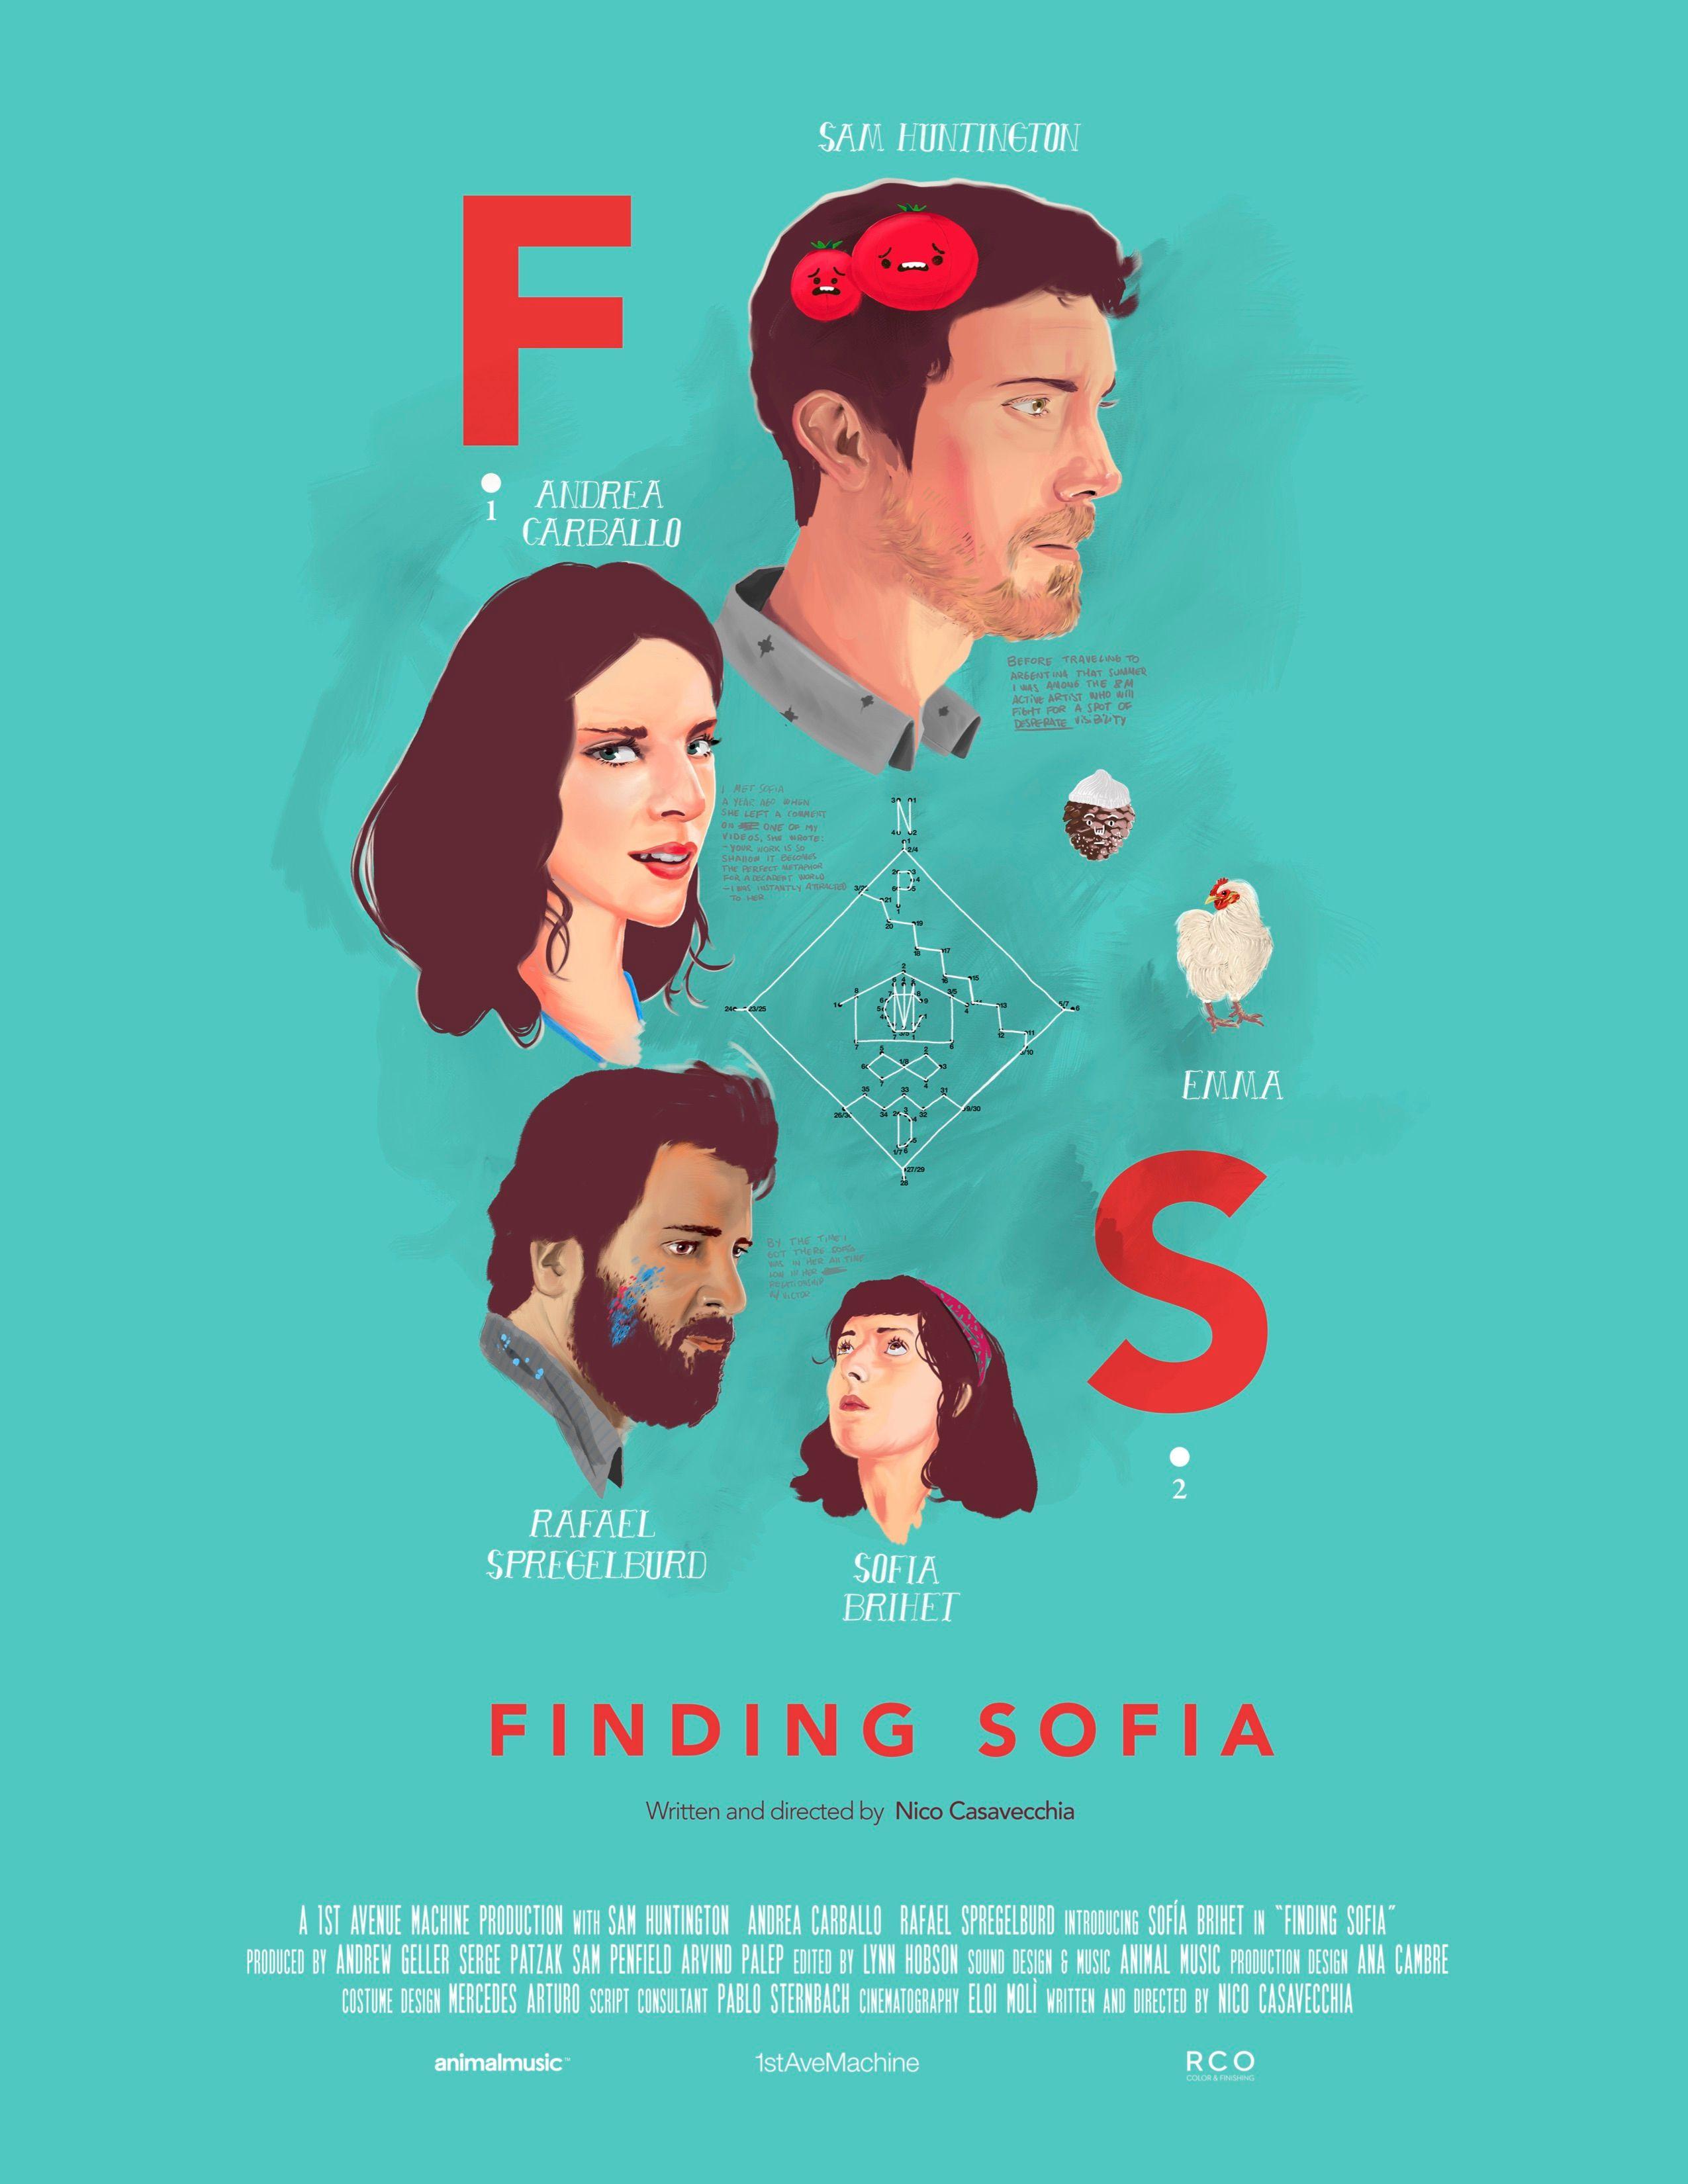 Finding_Sofia_Press_Kit_04072016.jpg